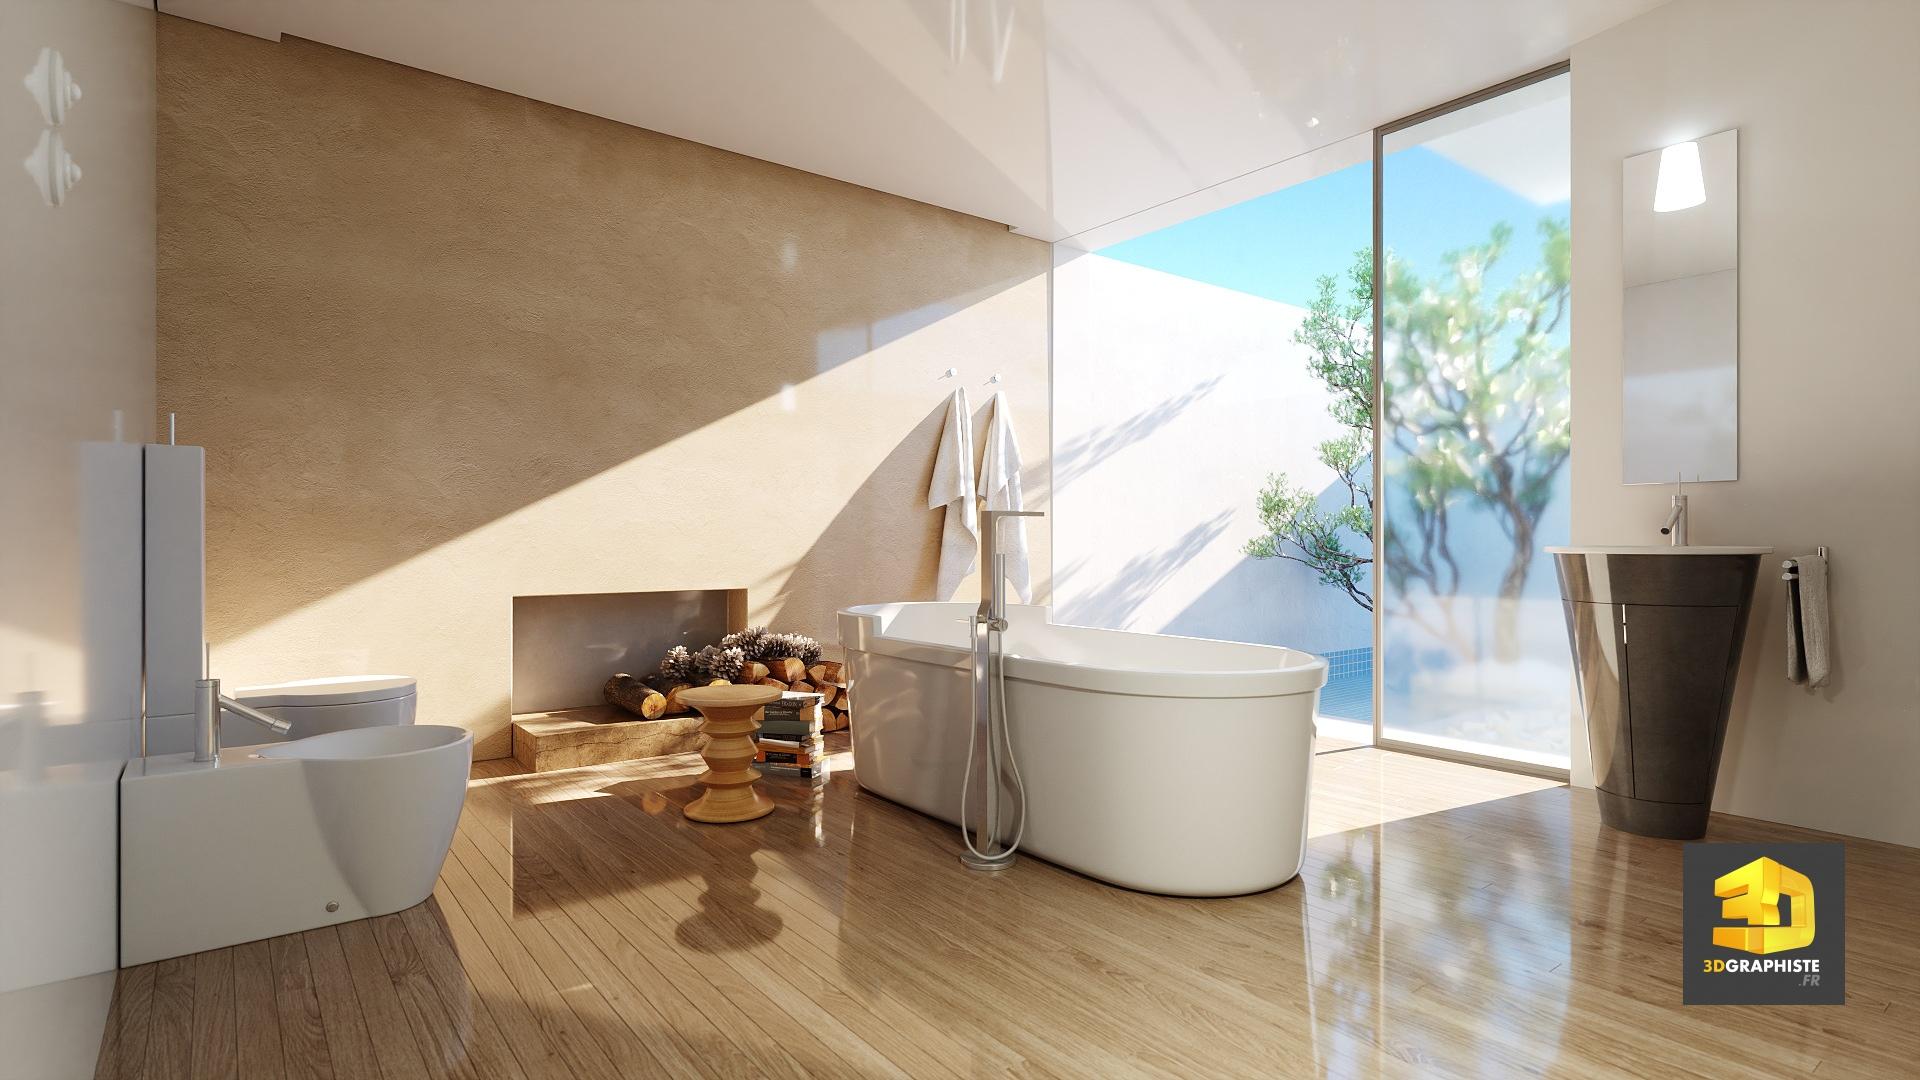 infographiste architecture cr ation de perspectives et d 39 animations 3d. Black Bedroom Furniture Sets. Home Design Ideas